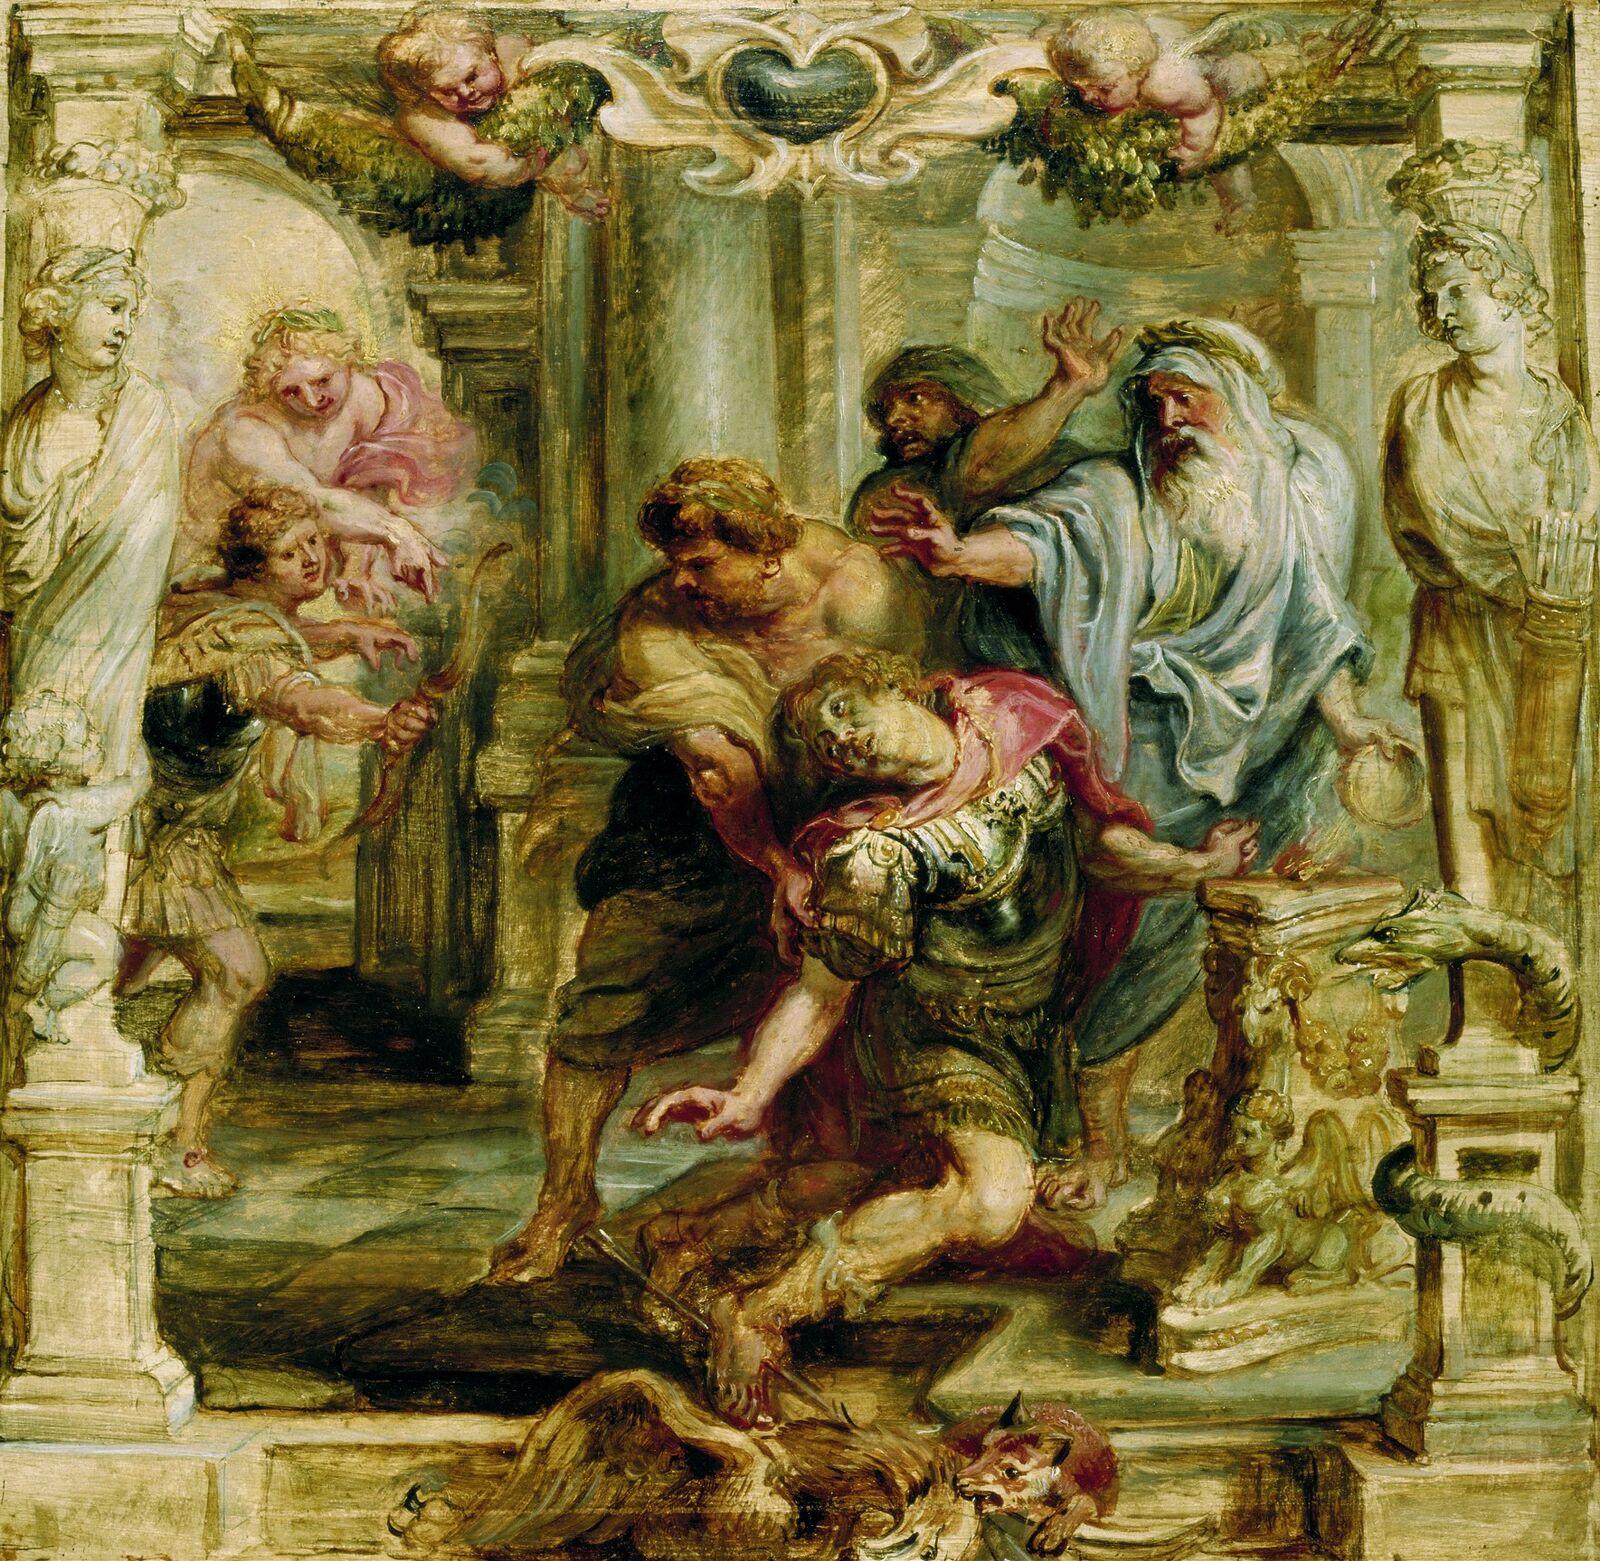 661b11e21c5a HÉROS DE JADIS 1 2   Invincibles   - Lettres d Arts, littérature et  histoire des arts